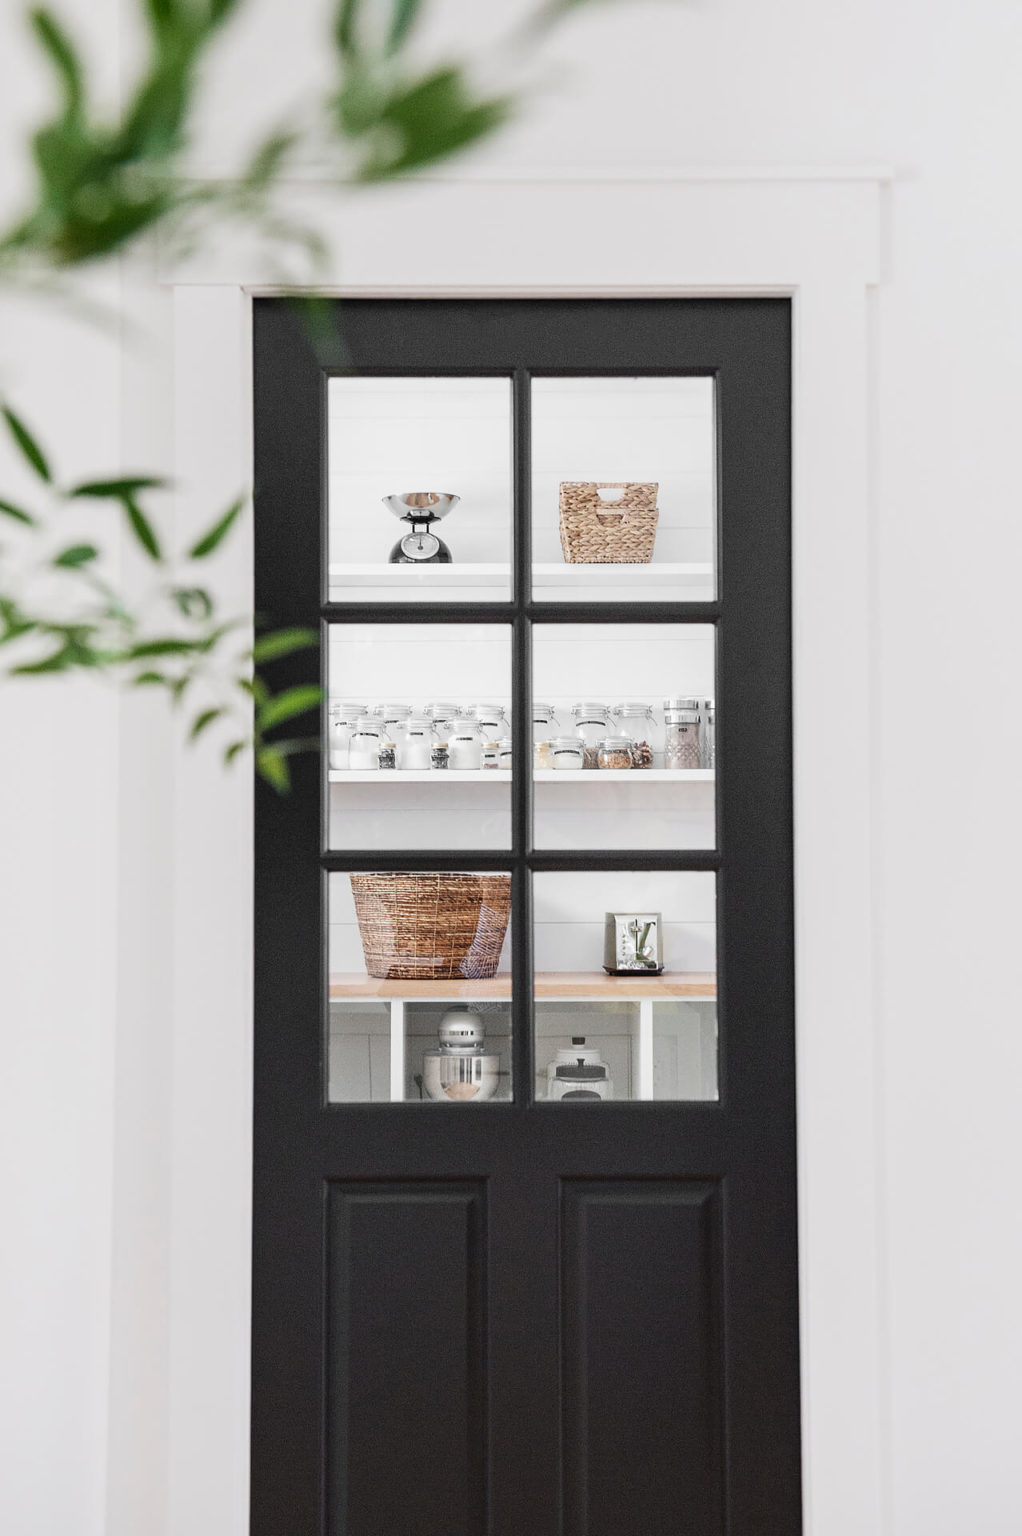 AKB Design cuisine blanche armoire noire poignee laiton comptoir quartz garde manger 19